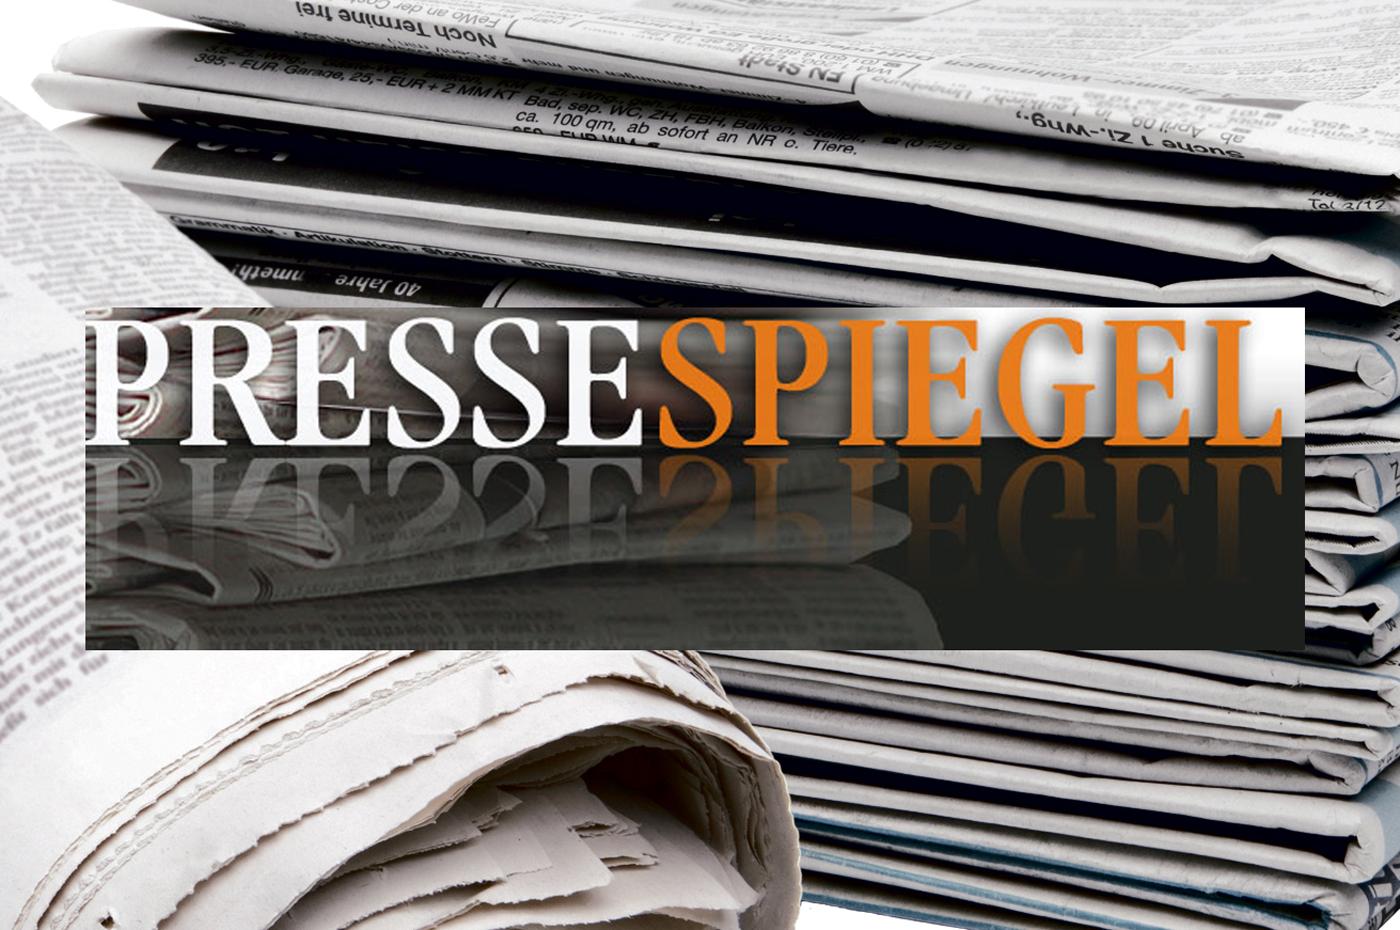 presse_stapel.jpg